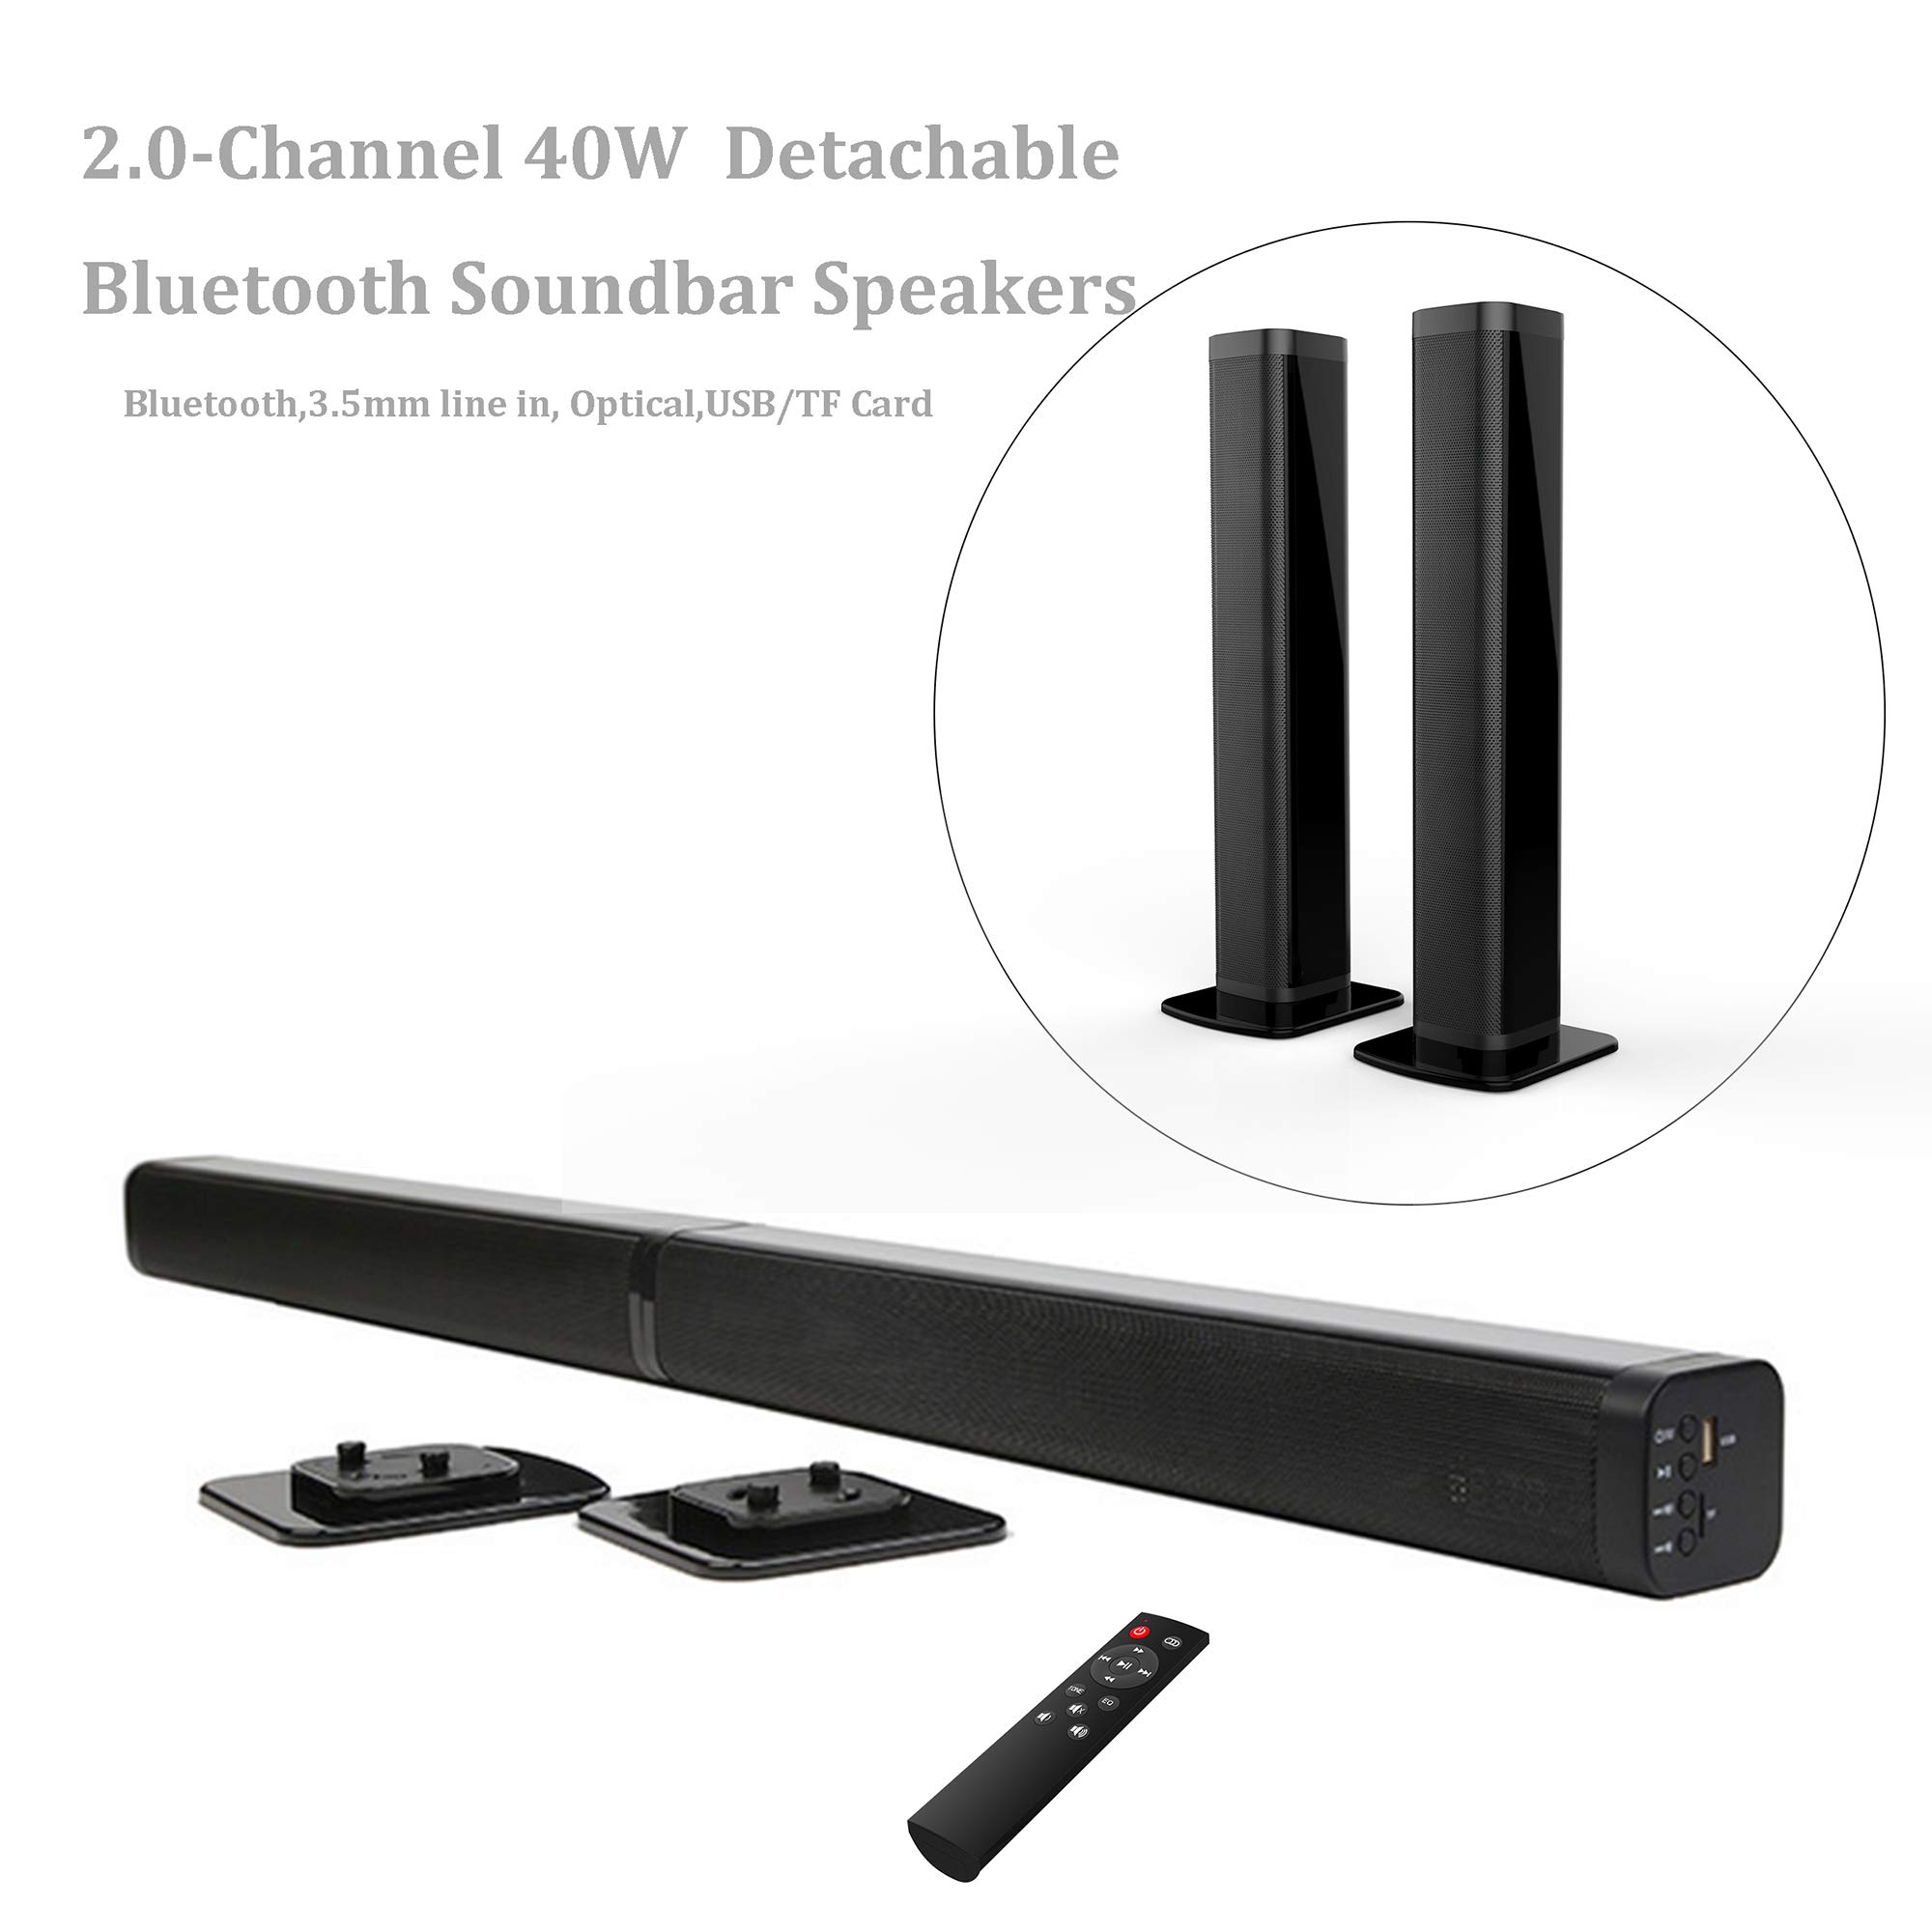 Samtronic Detachable Soundbar Wireless Bluetooth